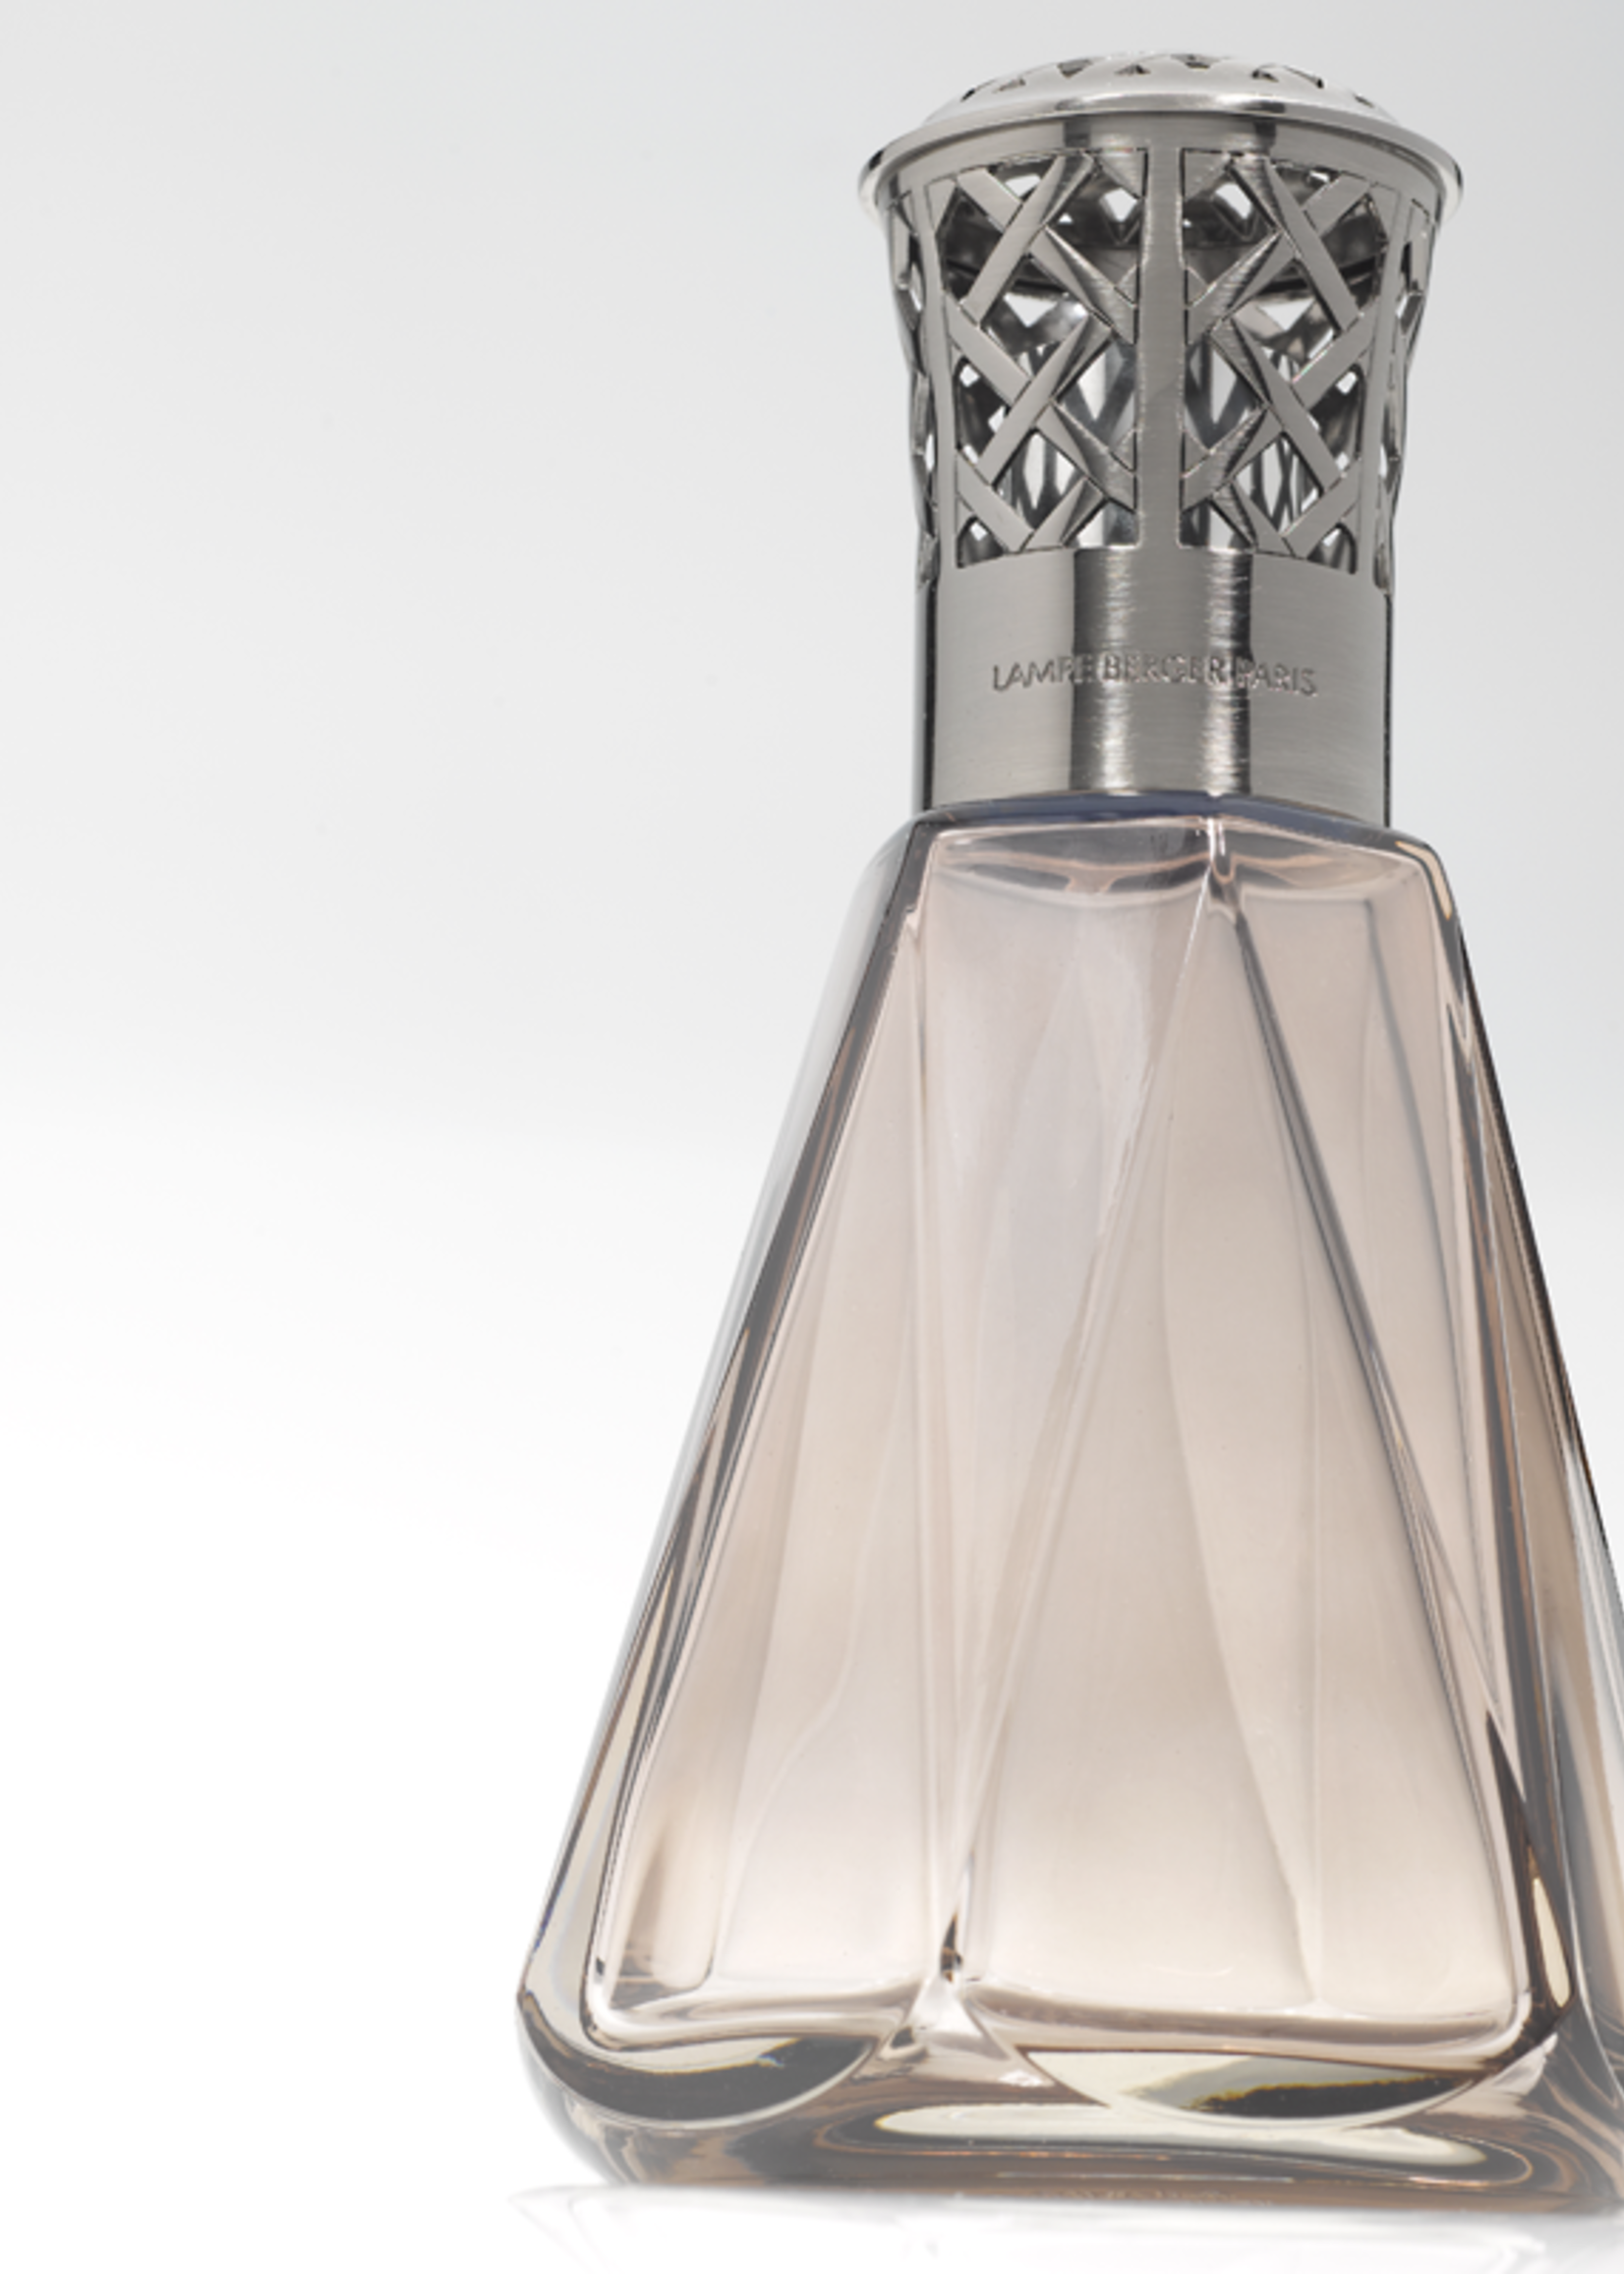 Maison Berger Coffret Lampe Berger Pyramide Rose Antique